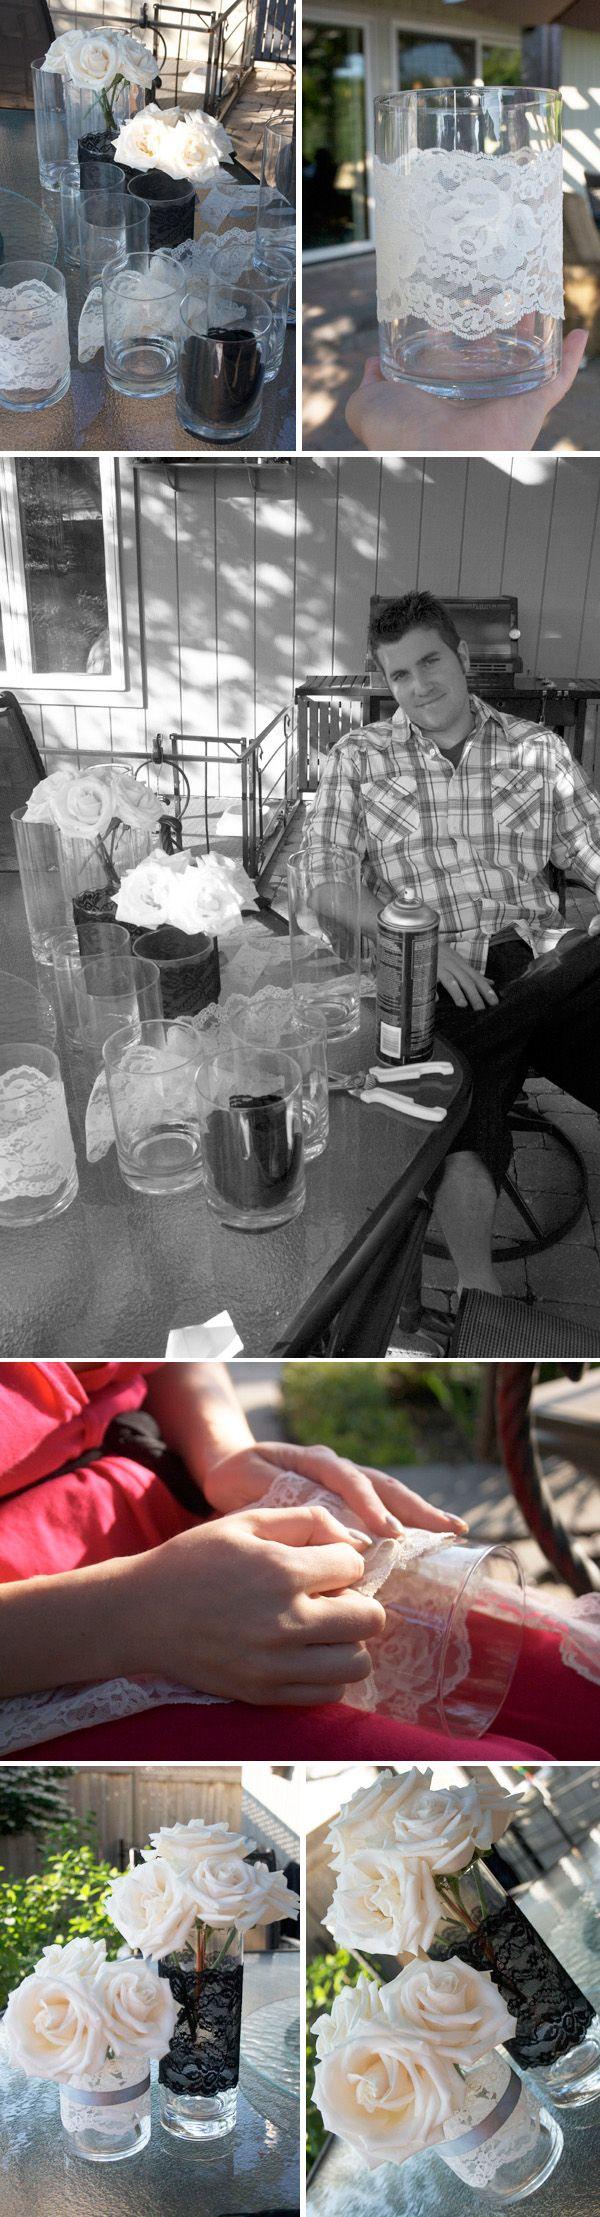 DIY Lace Vases ..... @Marisa Rouzic McClellan McClellan Elizabeth @Kathi Bishop Bishop Bishop Visperas @Yolanda Imamura Imamura Imamura Calimpong